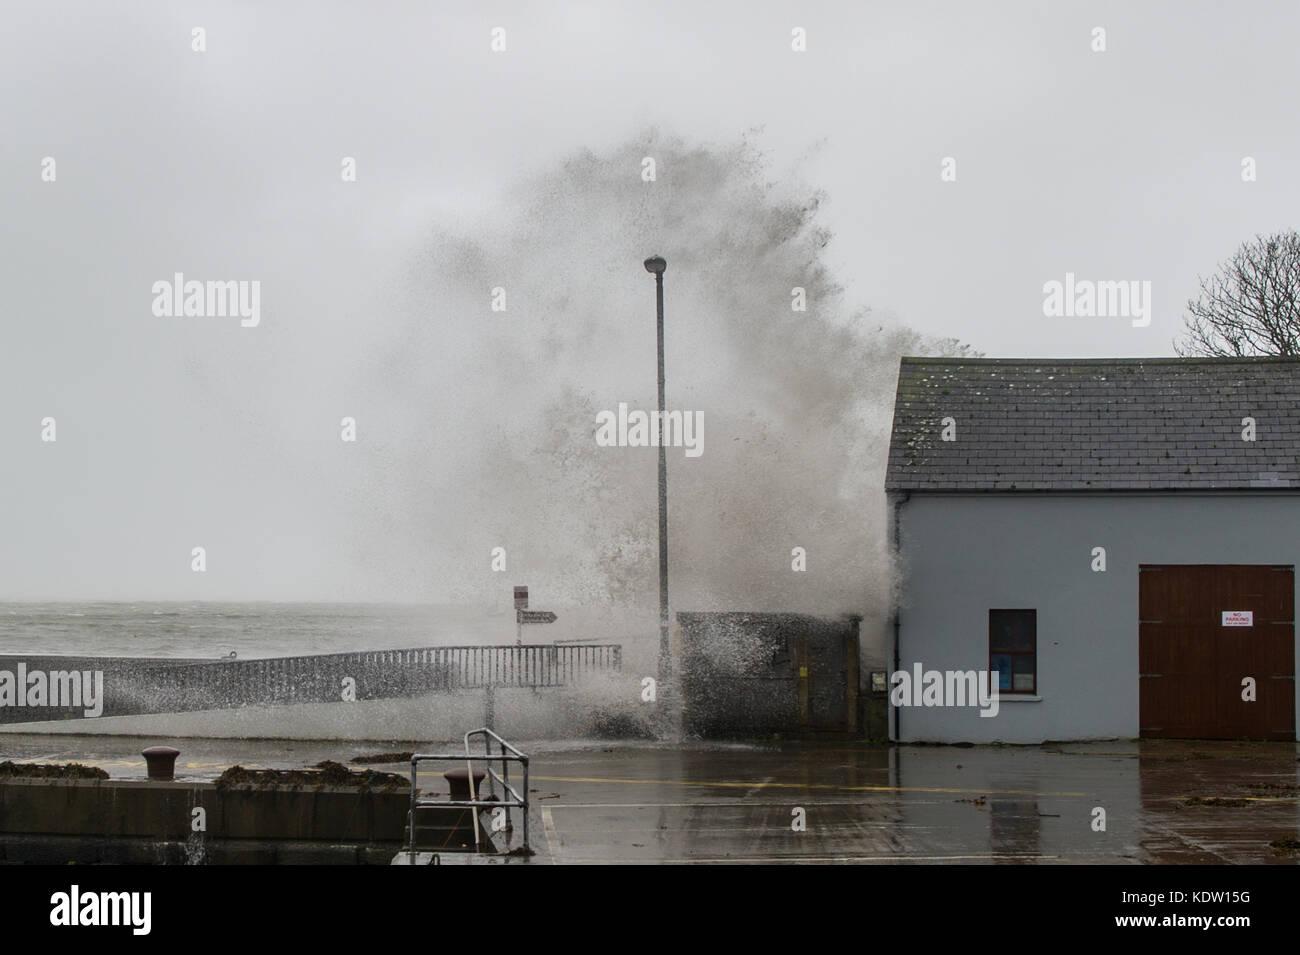 schull-ireland-16th-oct-2017-ex-hurrican